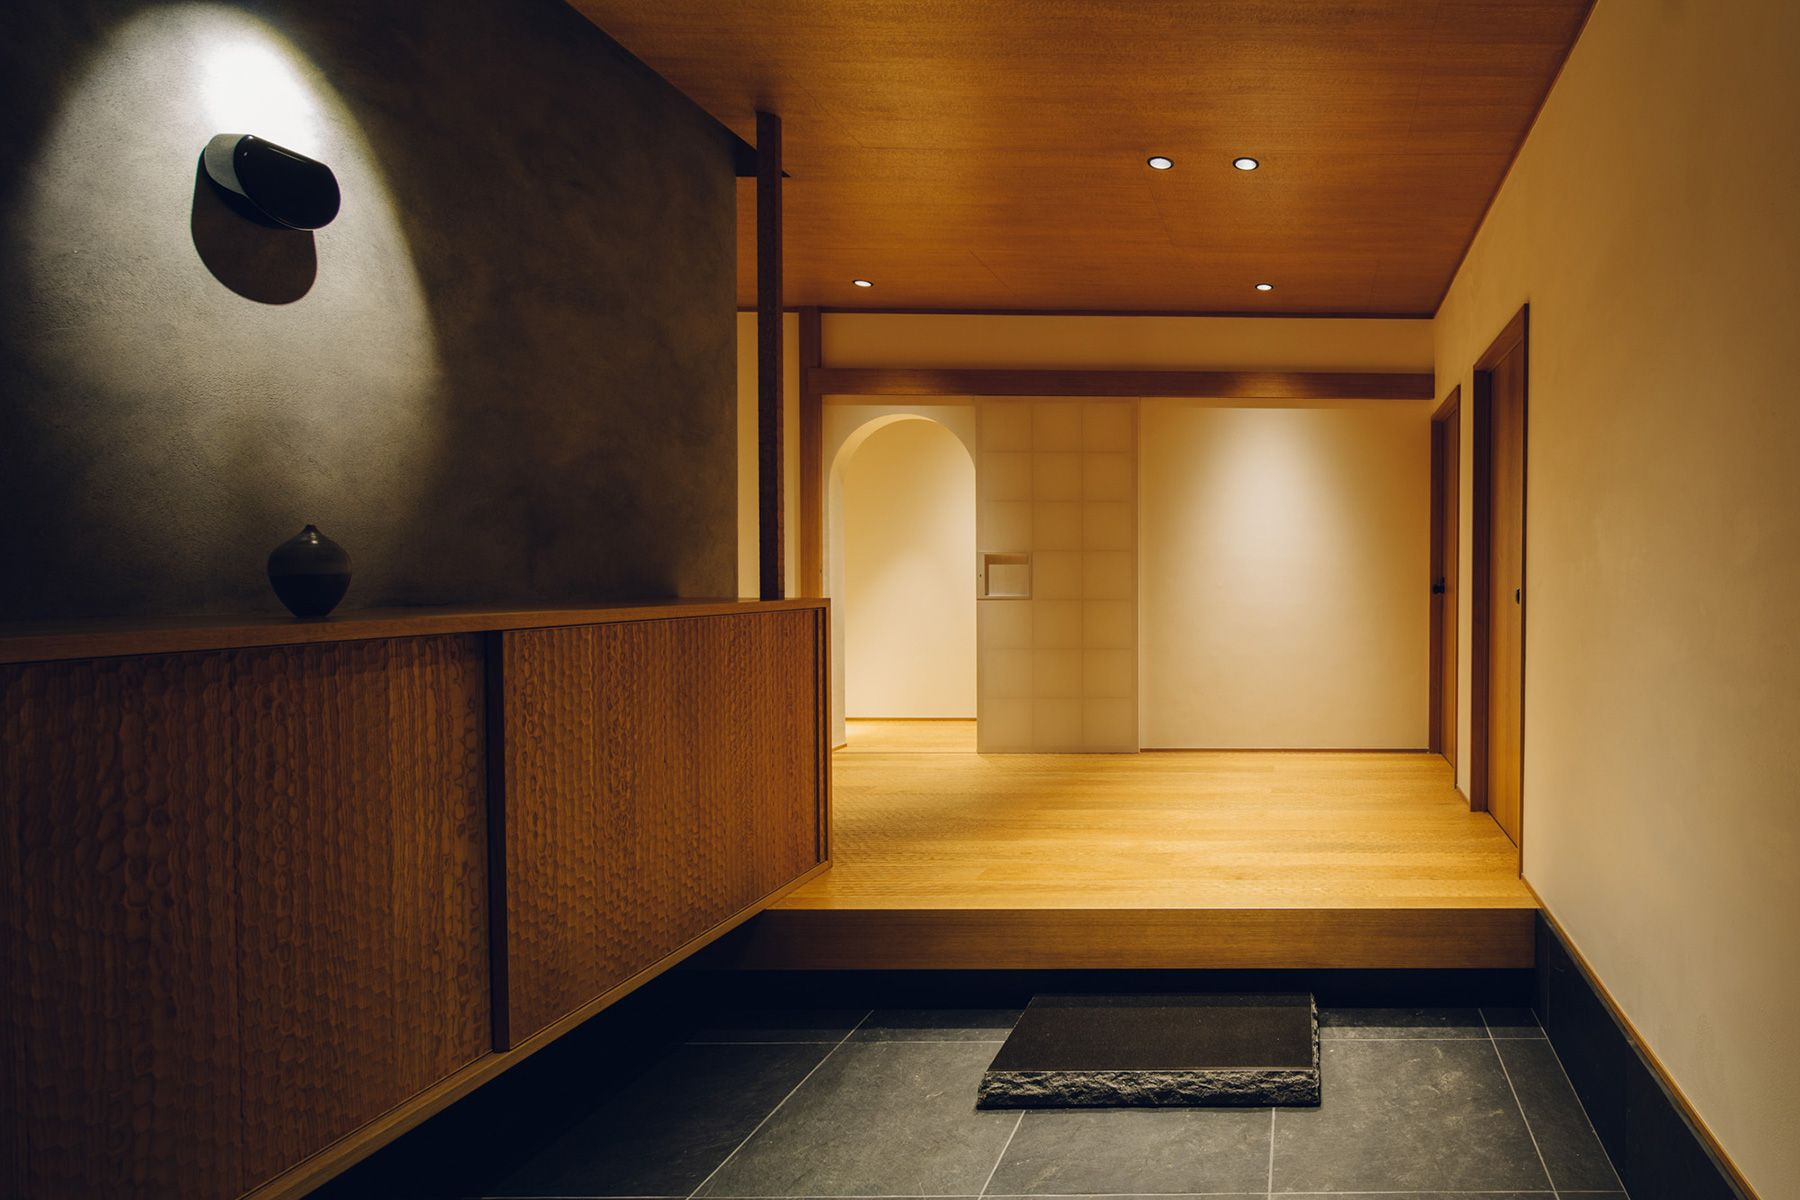 Toya studio(トーヤスタジオ)entrance